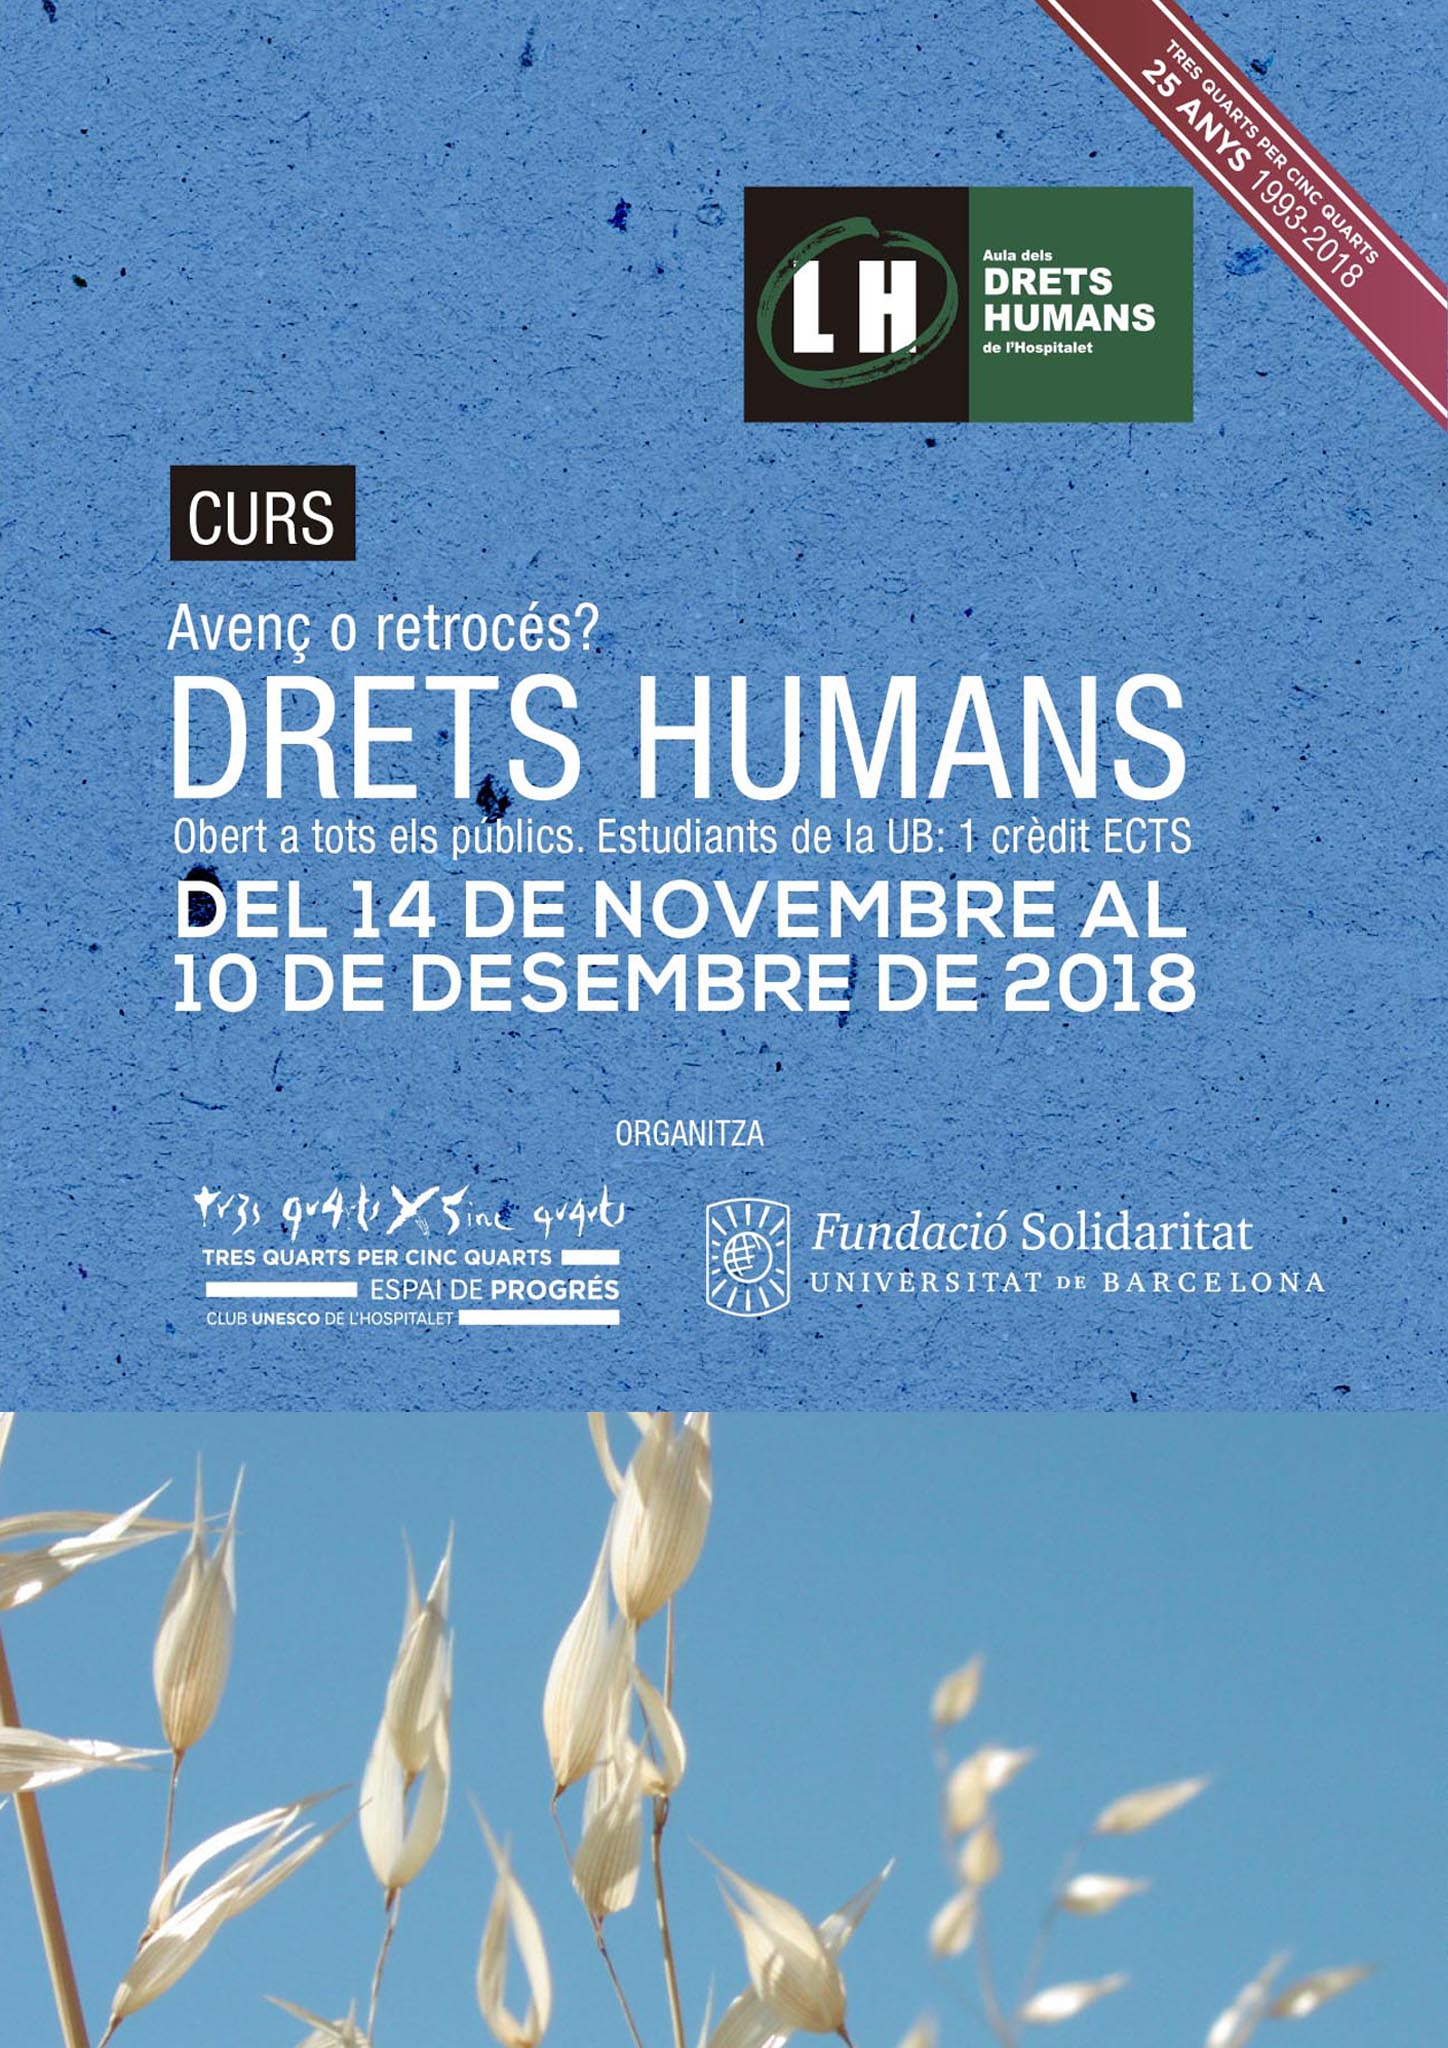 Drets humans, avenç o retrocés?